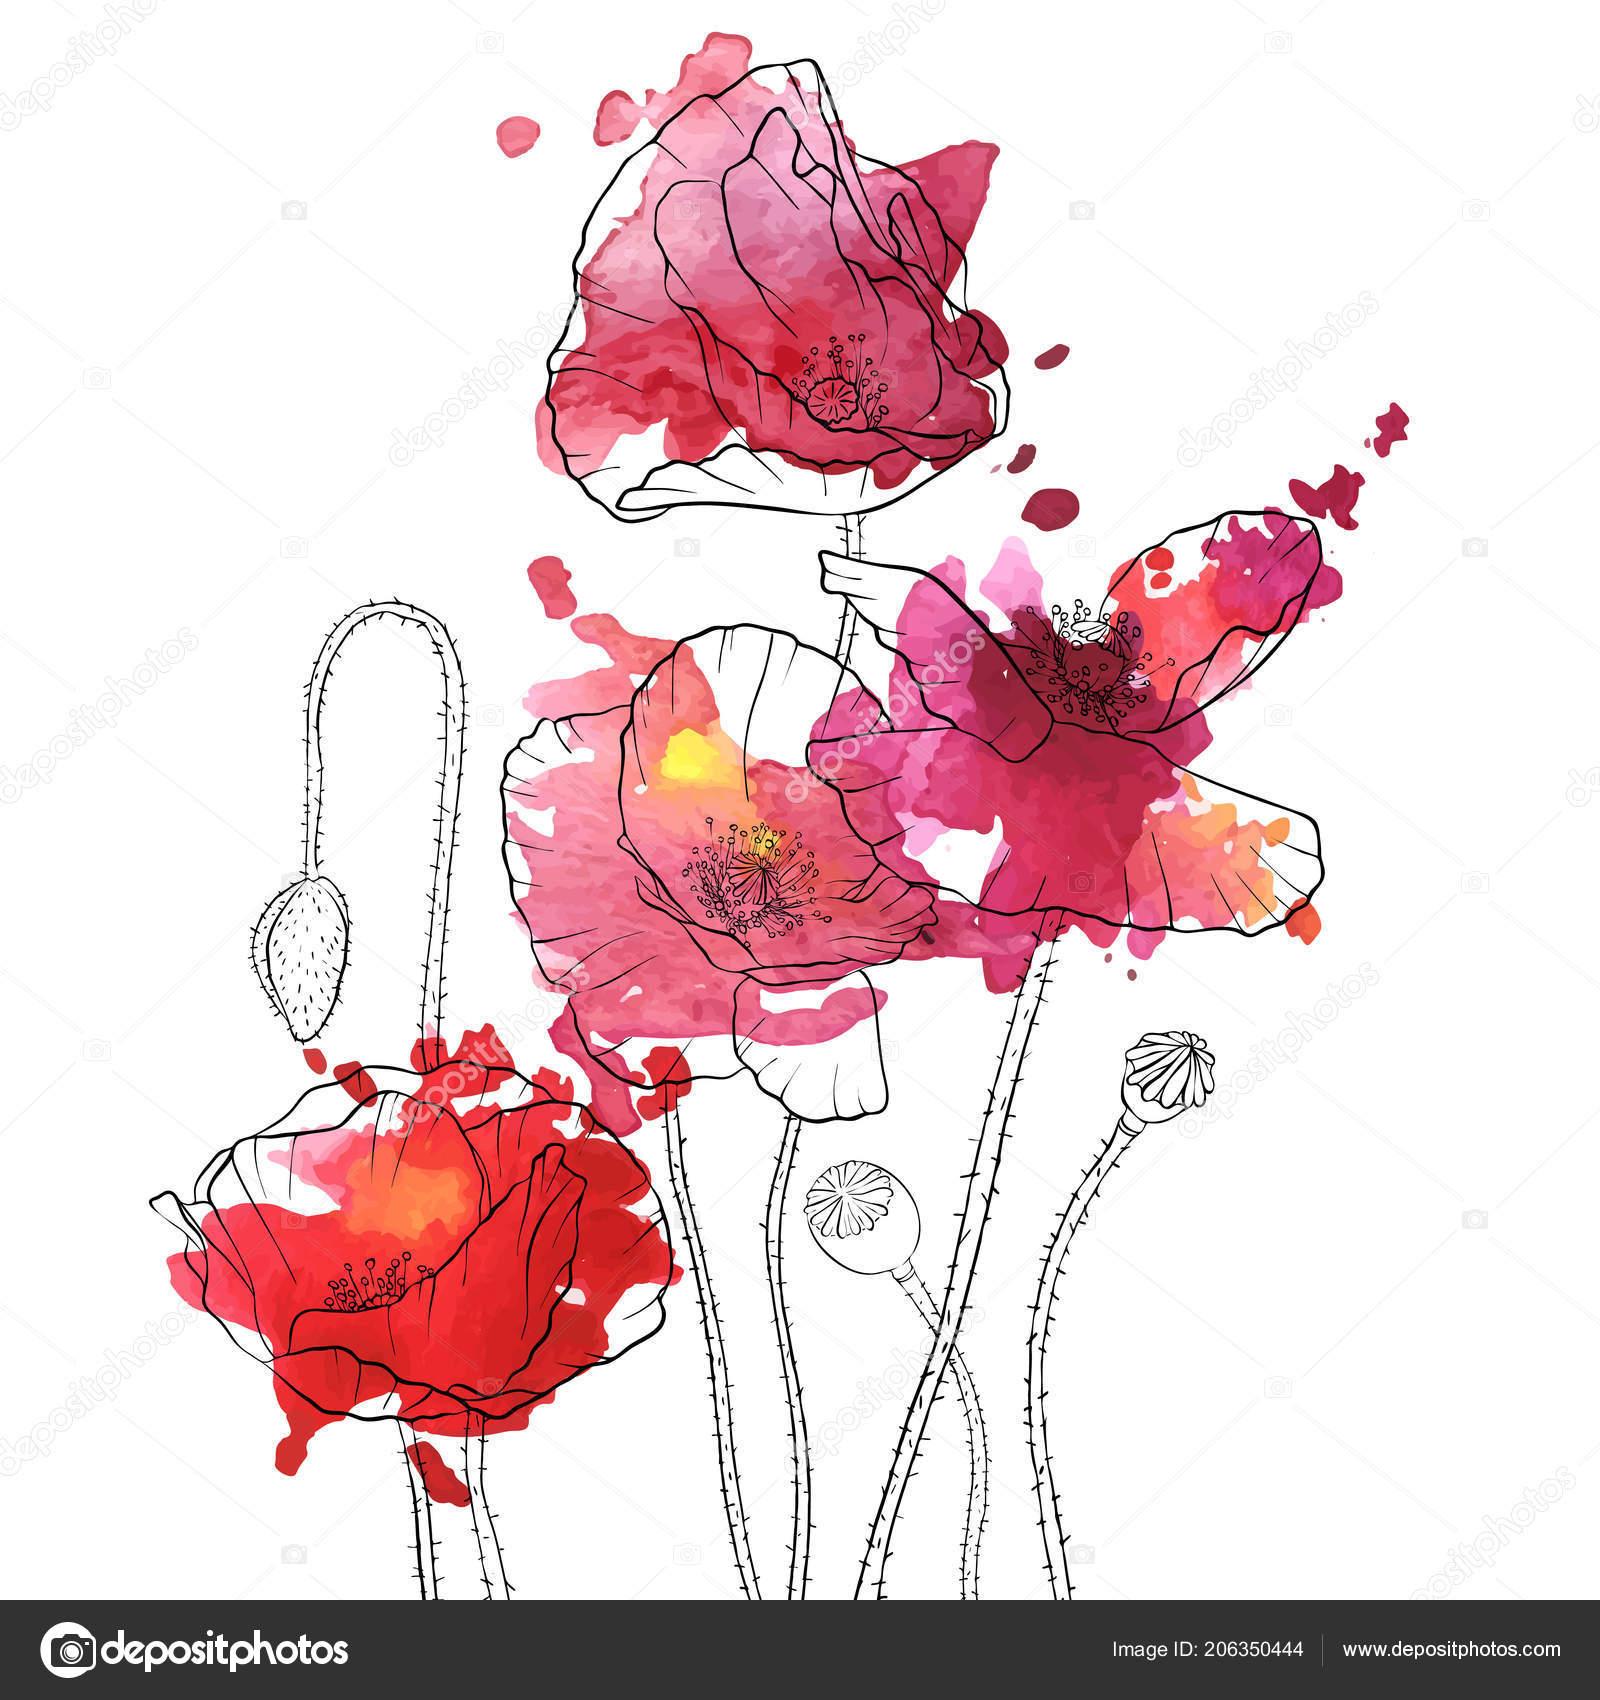 Vector drawing poppy flowers stock vector catarchangel 206350444 vector drawing poppy flowers stock vector mightylinksfo